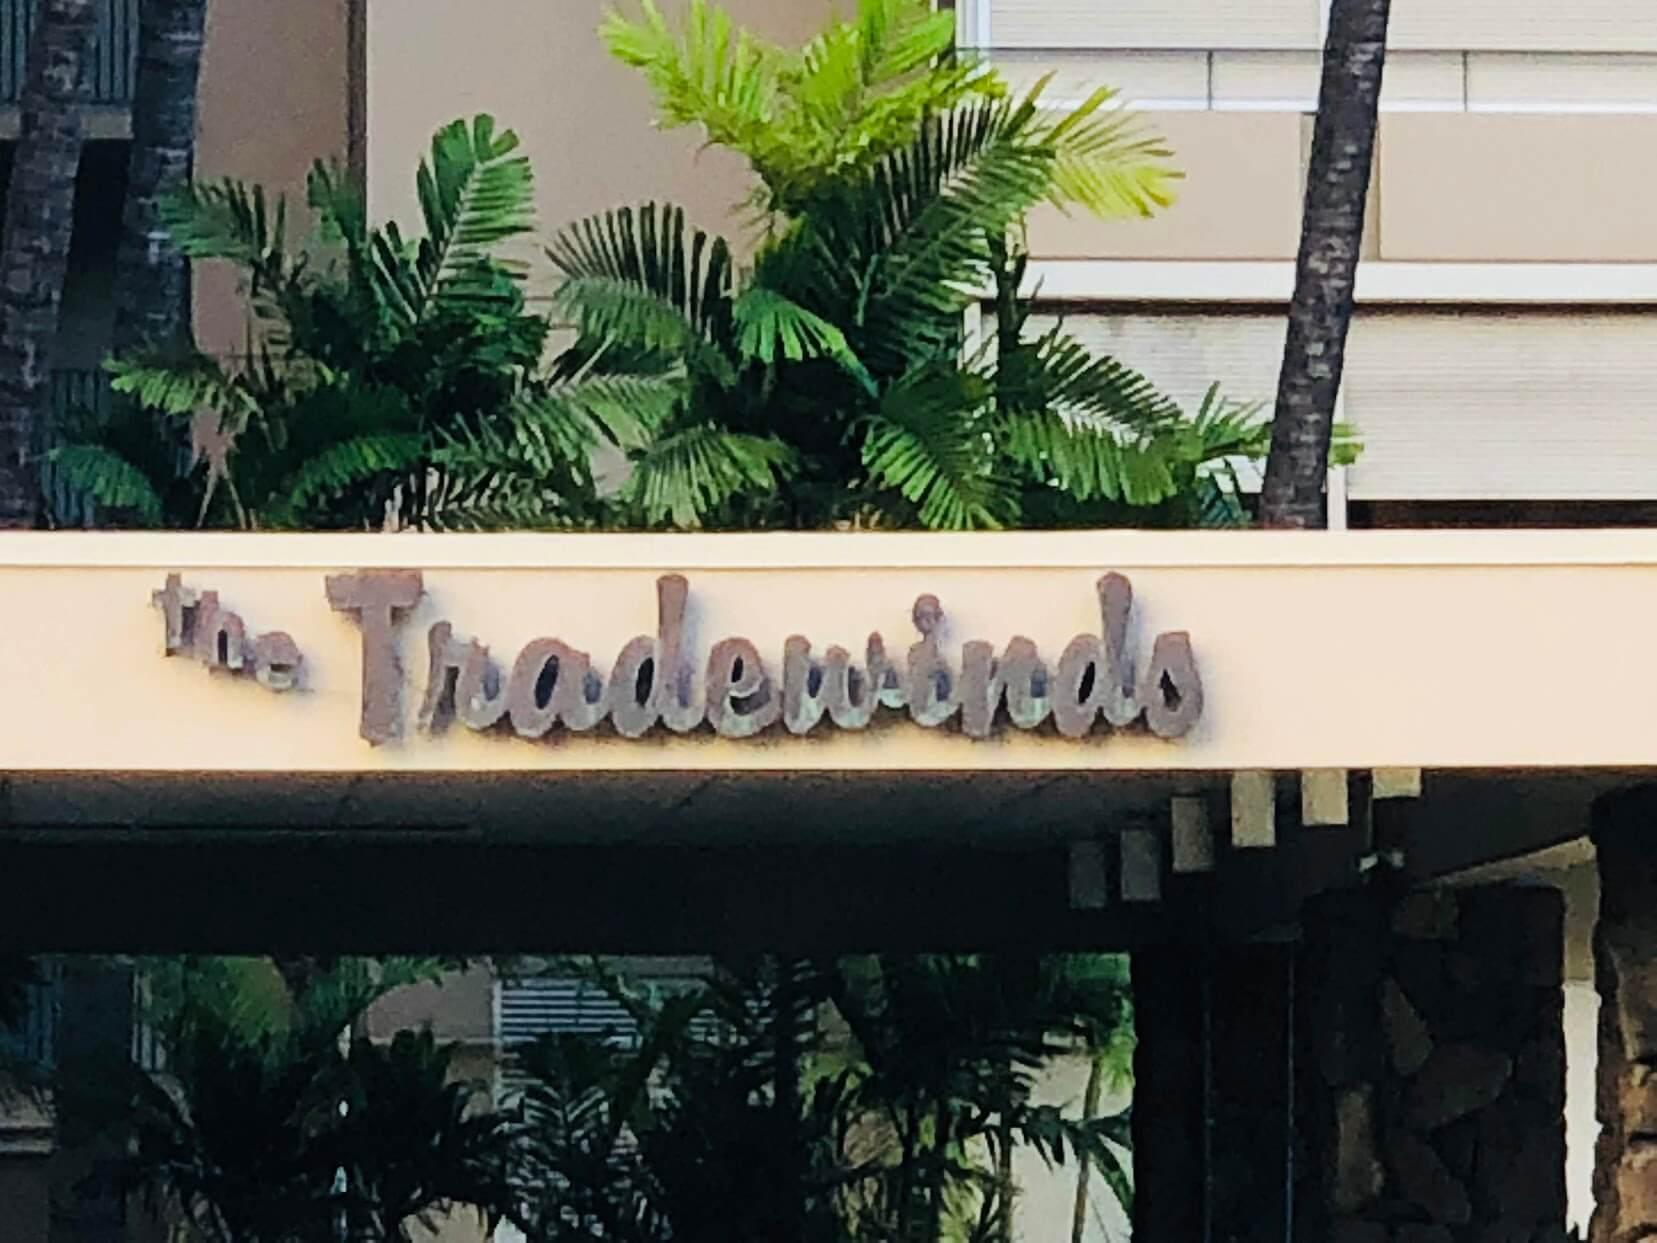 TheTradewindsの看板